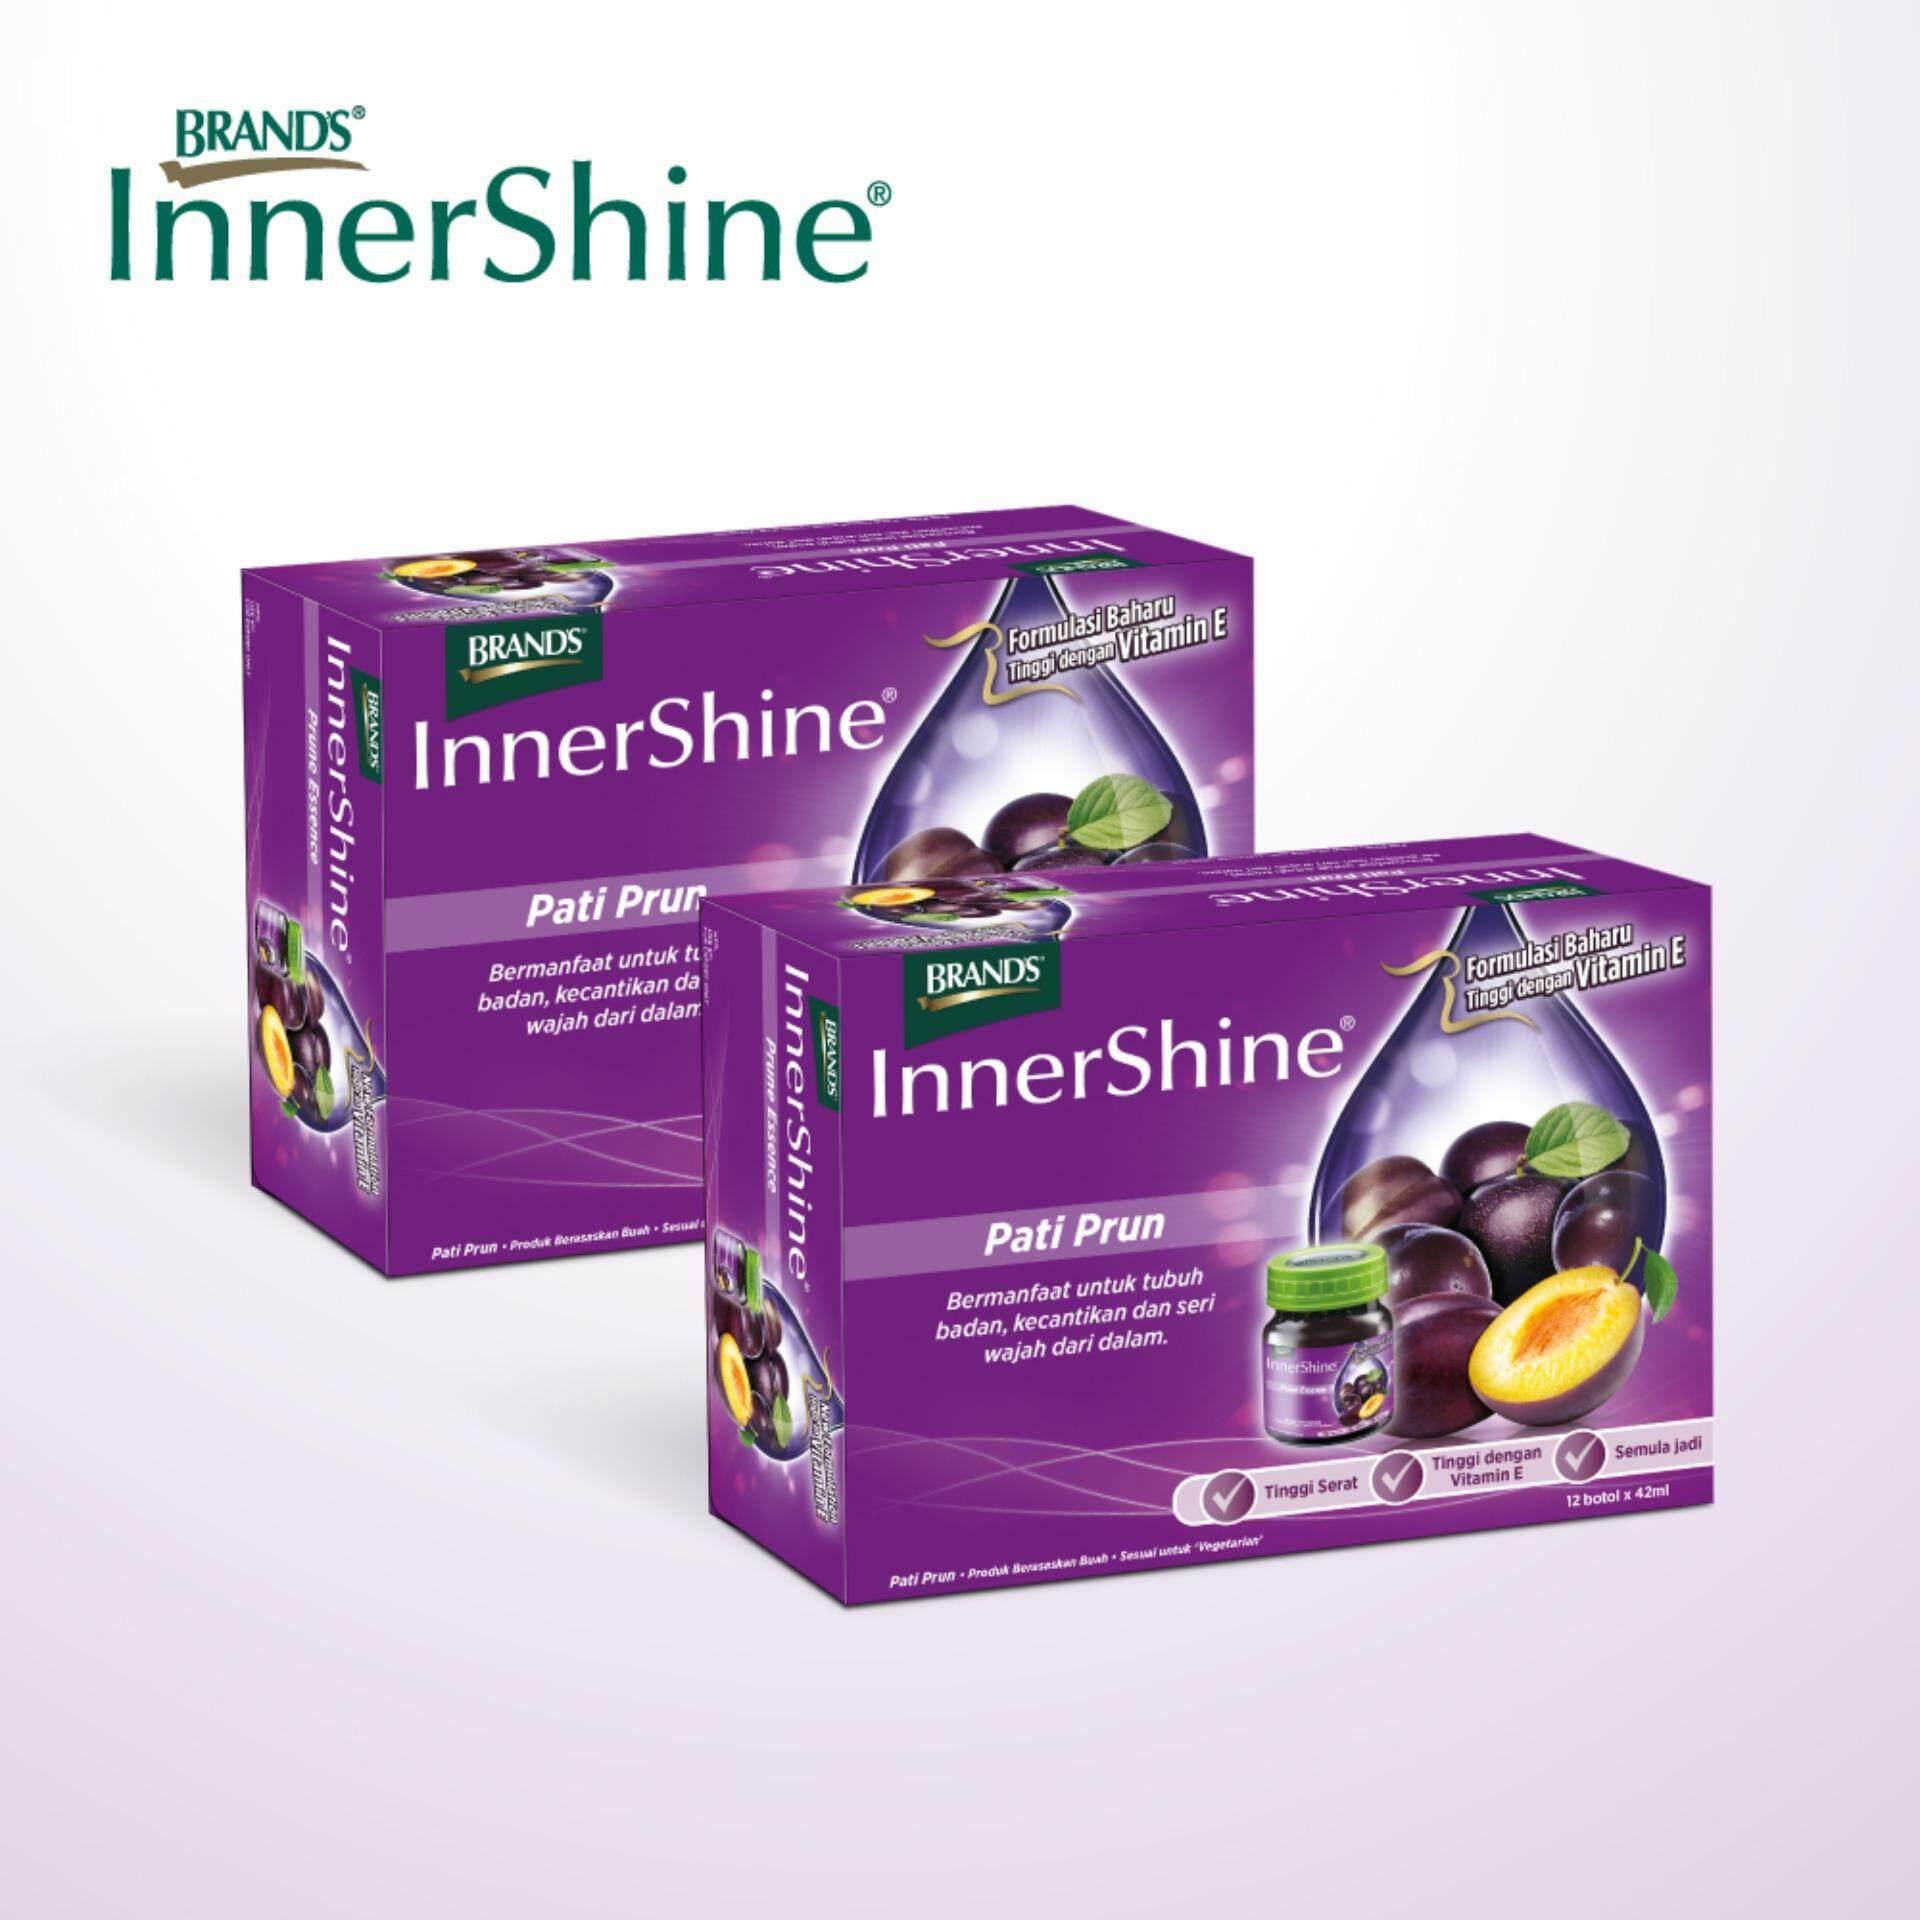 BRAND'S InnerShine Prune Essence  Twin Pack (6's) - 12 bottles x 42ml